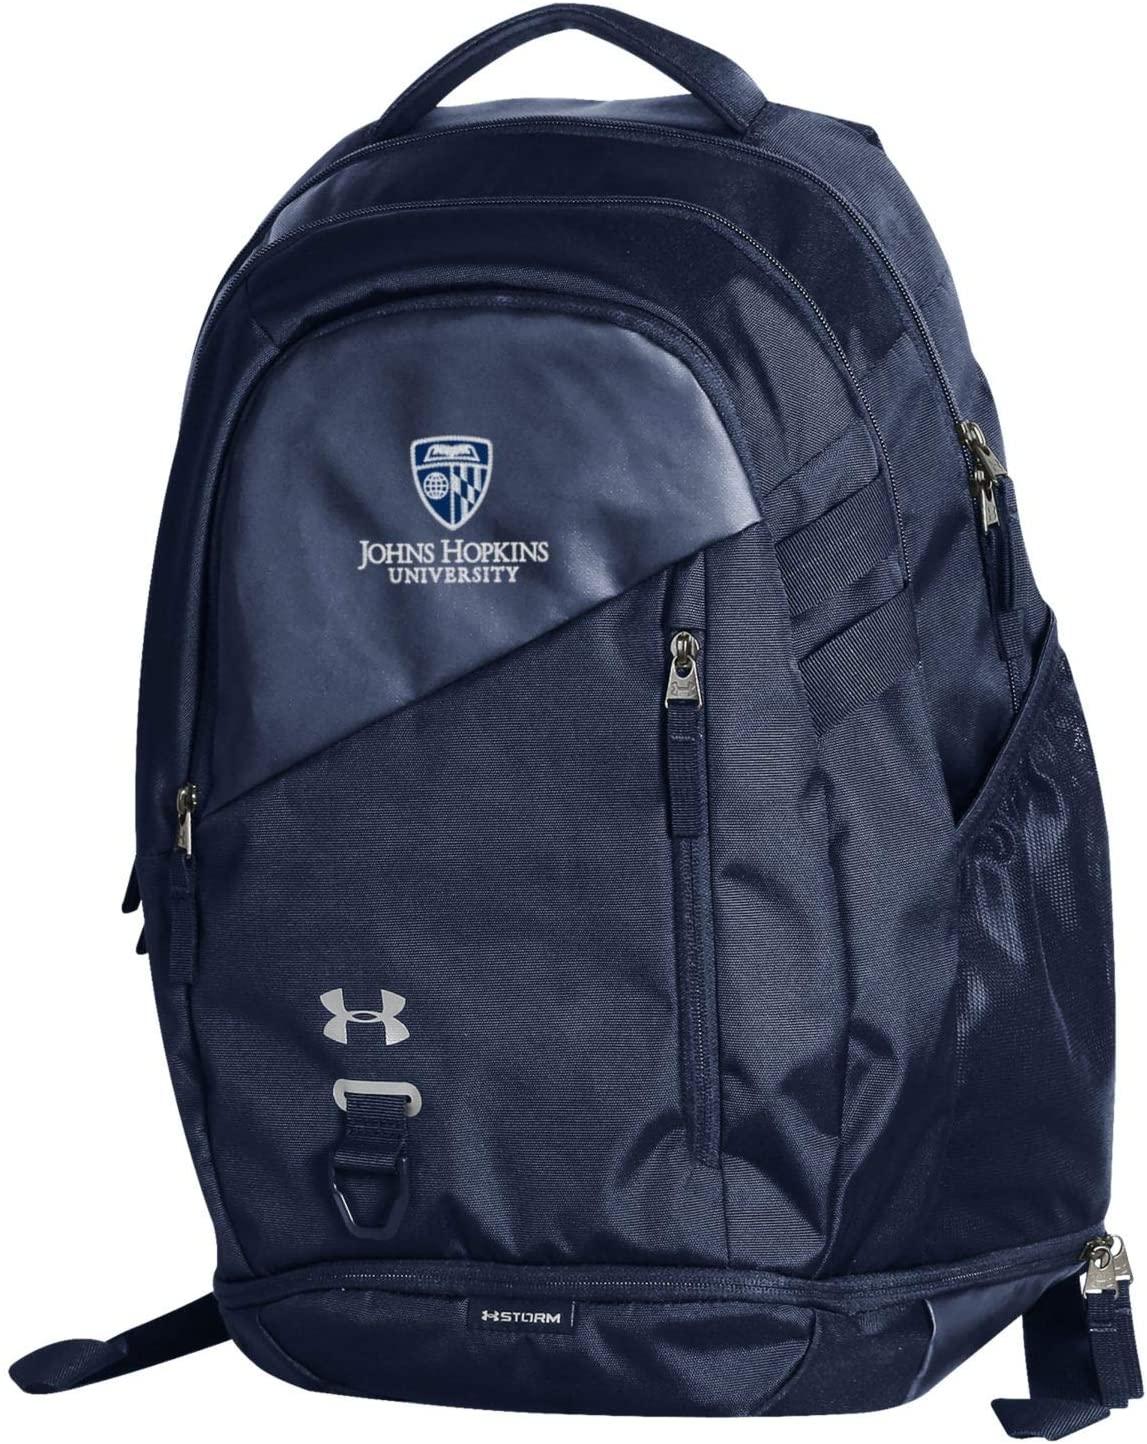 Johns Hopkins University Backpack Bag